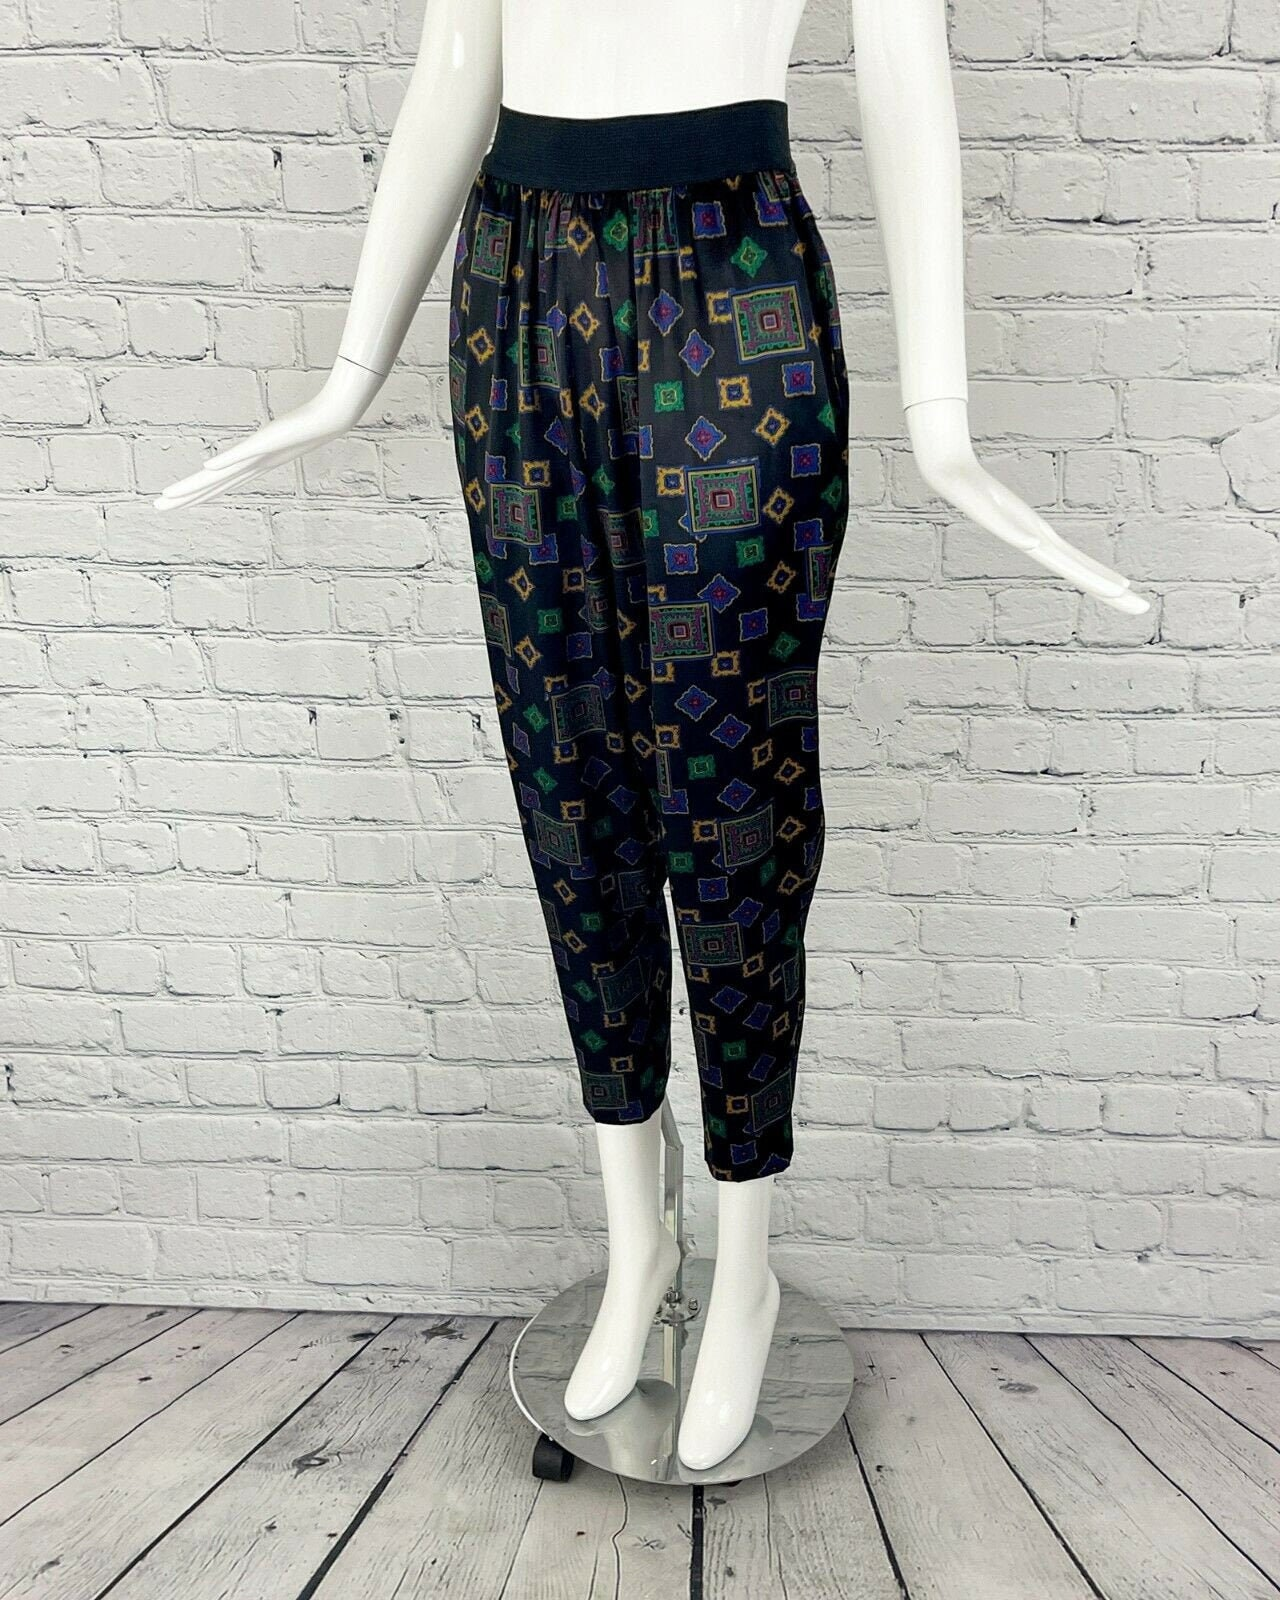 Vintage Scarf Styles -1920s to 1960s Liz Claiborne 1980S Vintage Womens Boho Hippie High Waisted Scarf Print Tapered Comfy Soft Harem Jogger Pants Size 6 $0.00 AT vintagedancer.com